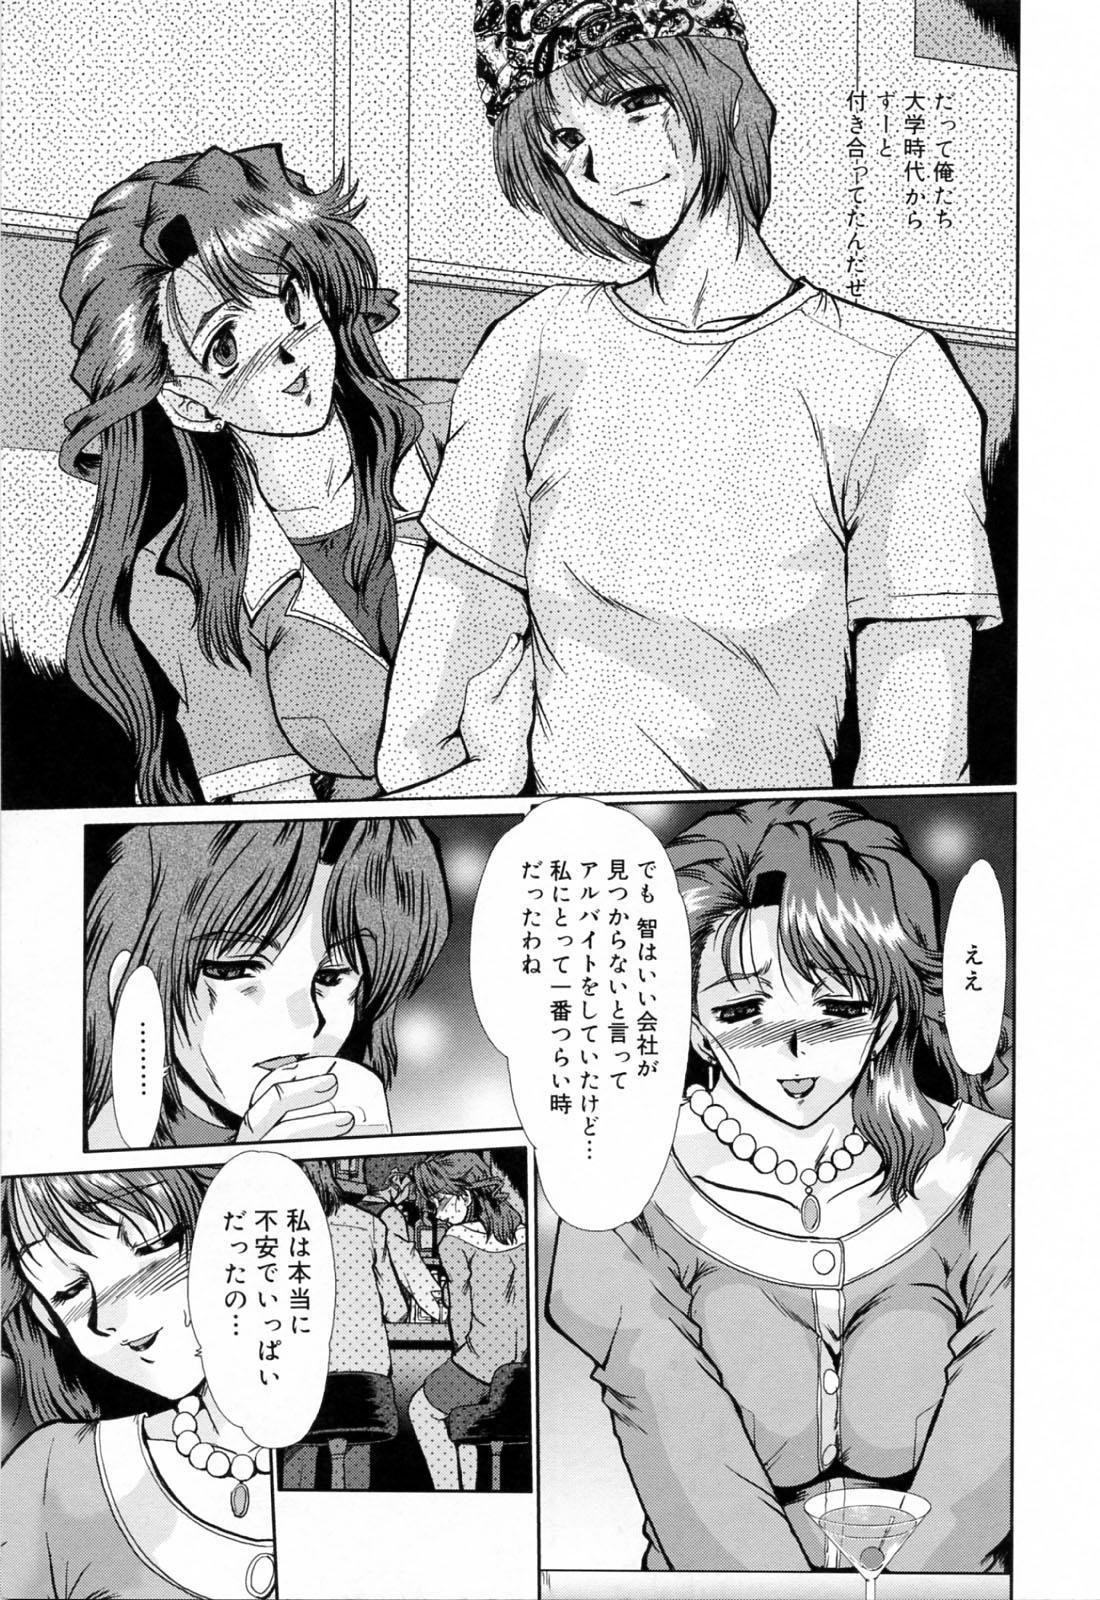 Kanjuku Hitozuma Nikki - The diary of the mature married woman 14